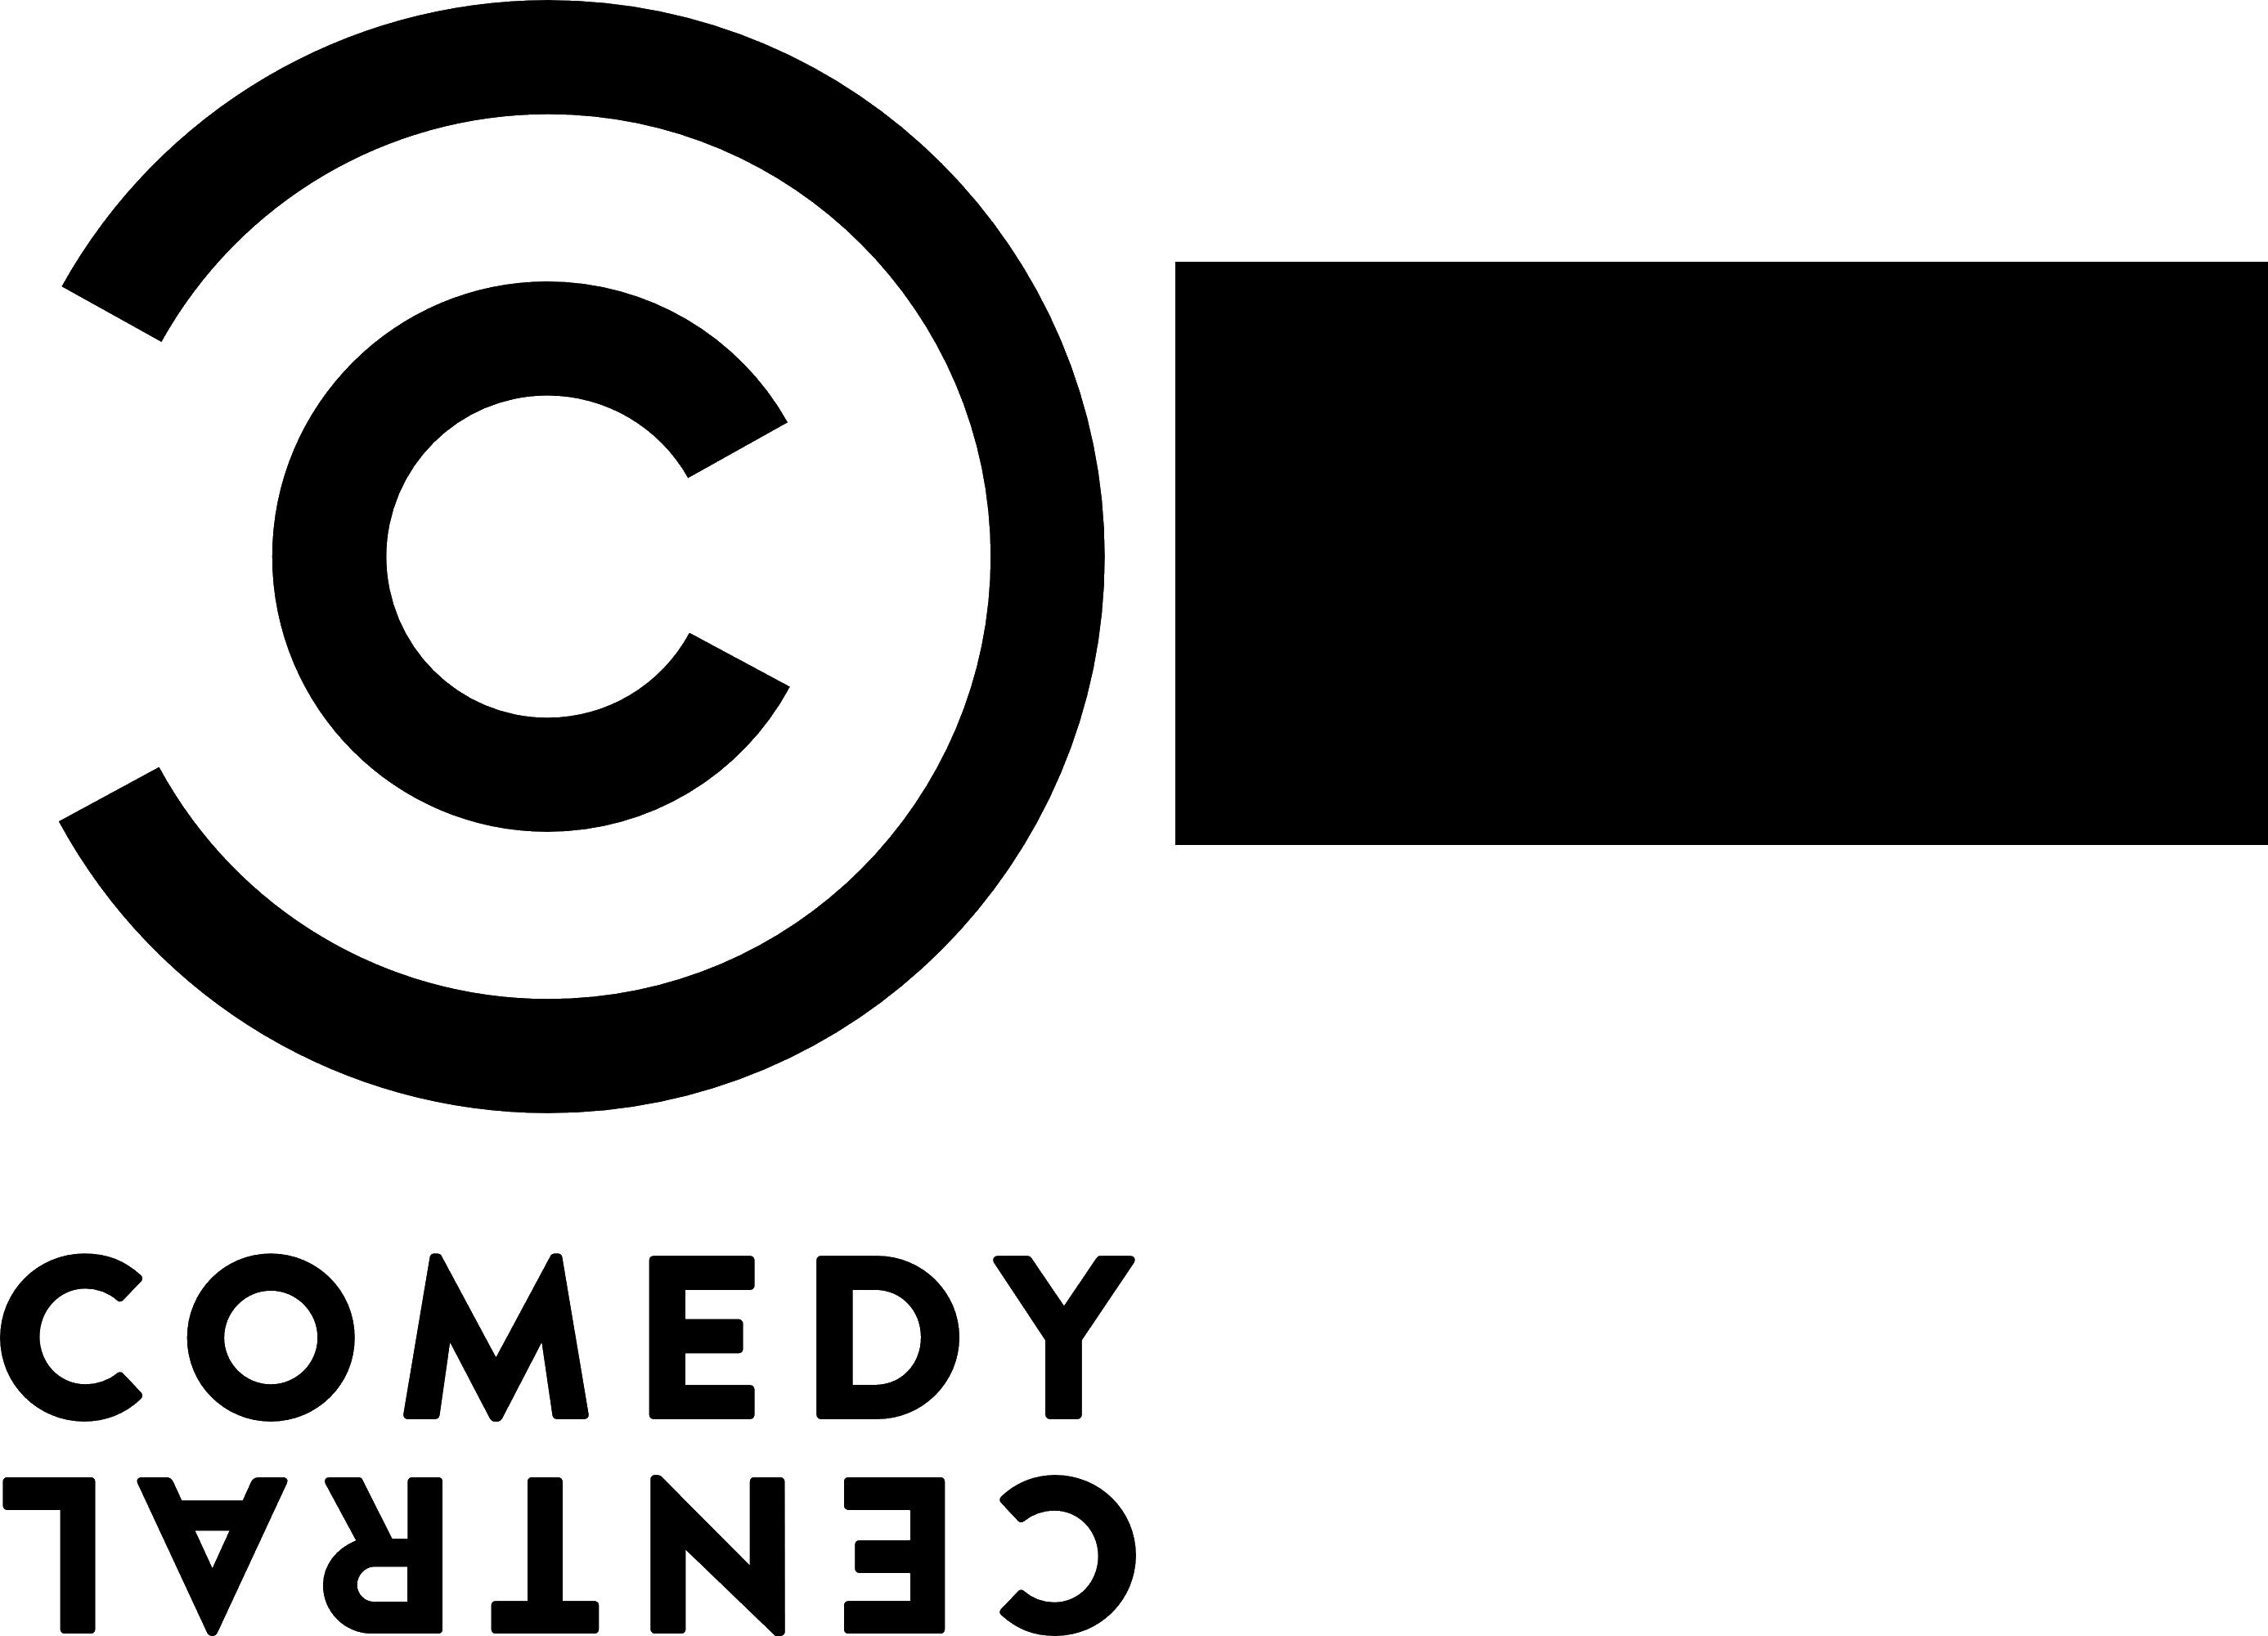 HD Comedy Central Hd 2013 Nv.